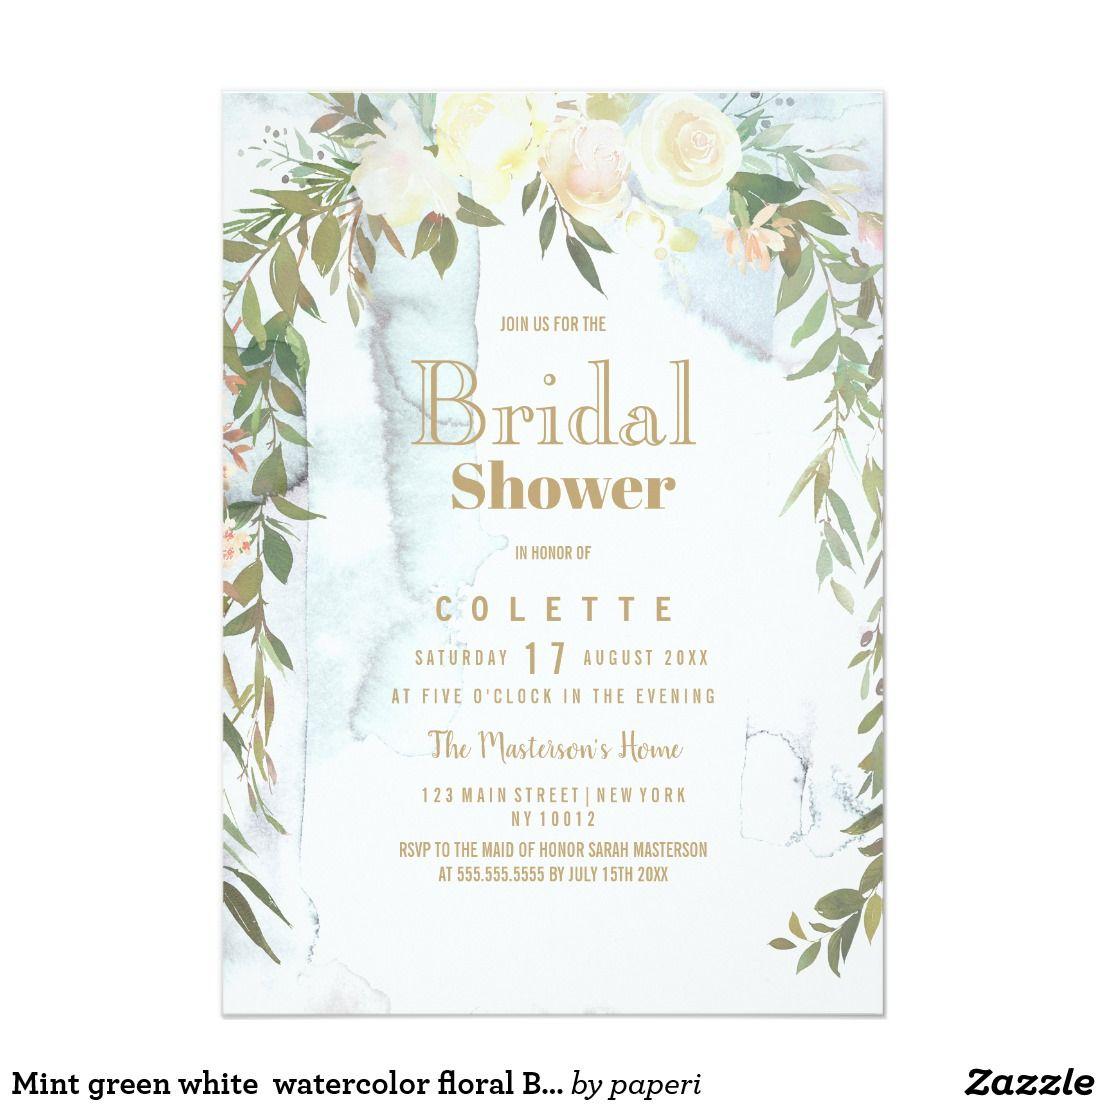 b2d4f0df44db Mint green white watercolor floral Bridal Shower Invitation (affiliate)